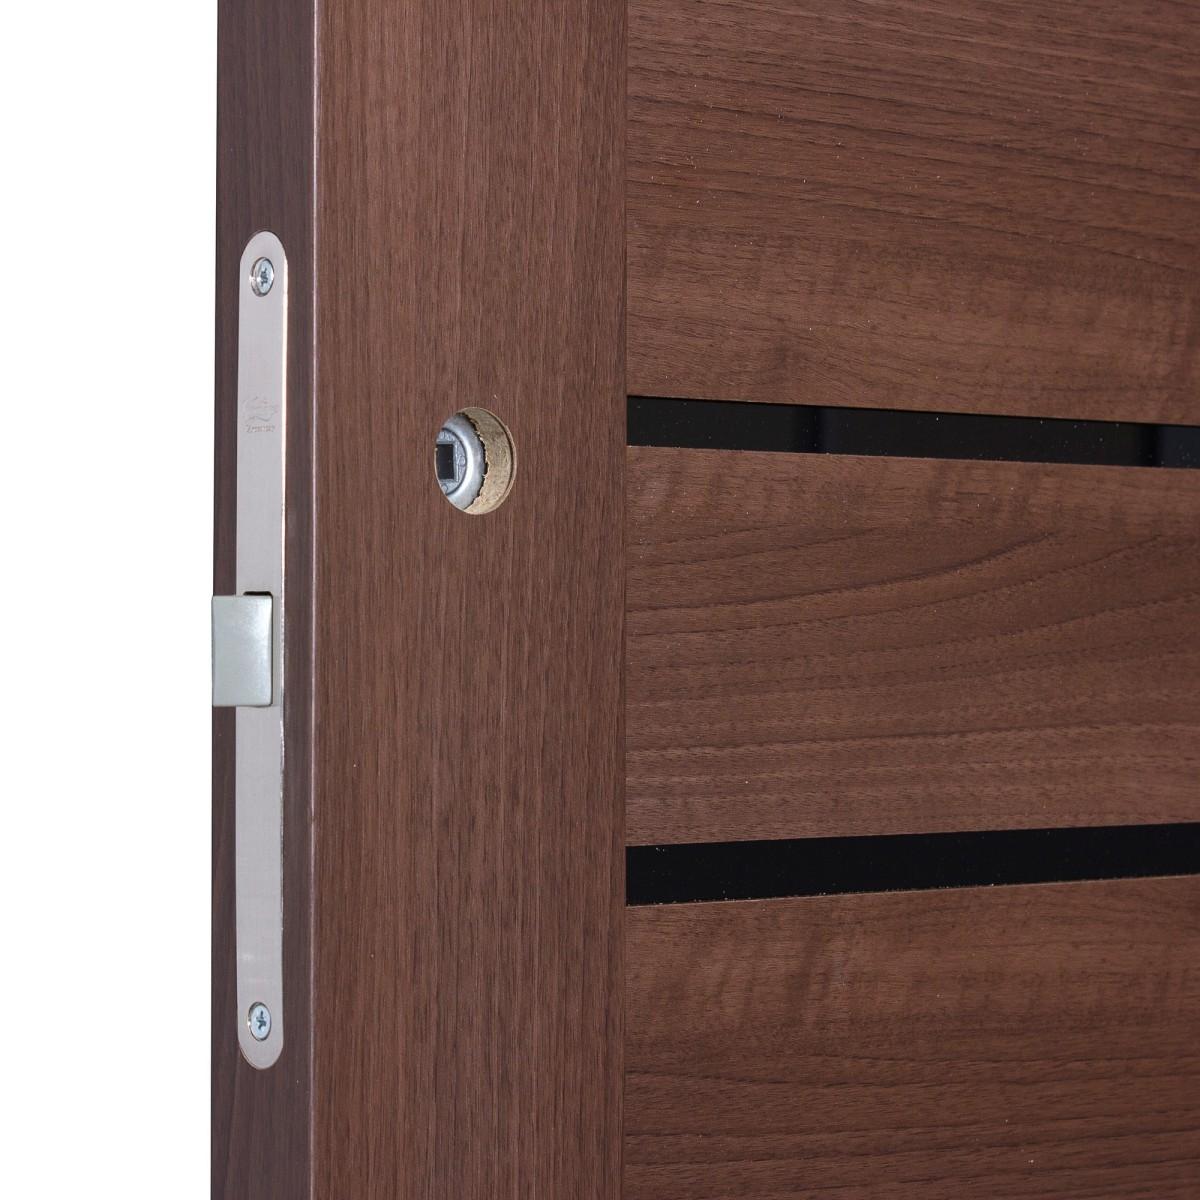 Дверь Межкомнатная Глухая Artens Велдон 90x200 Цвет Мокко Без Фурнитуры